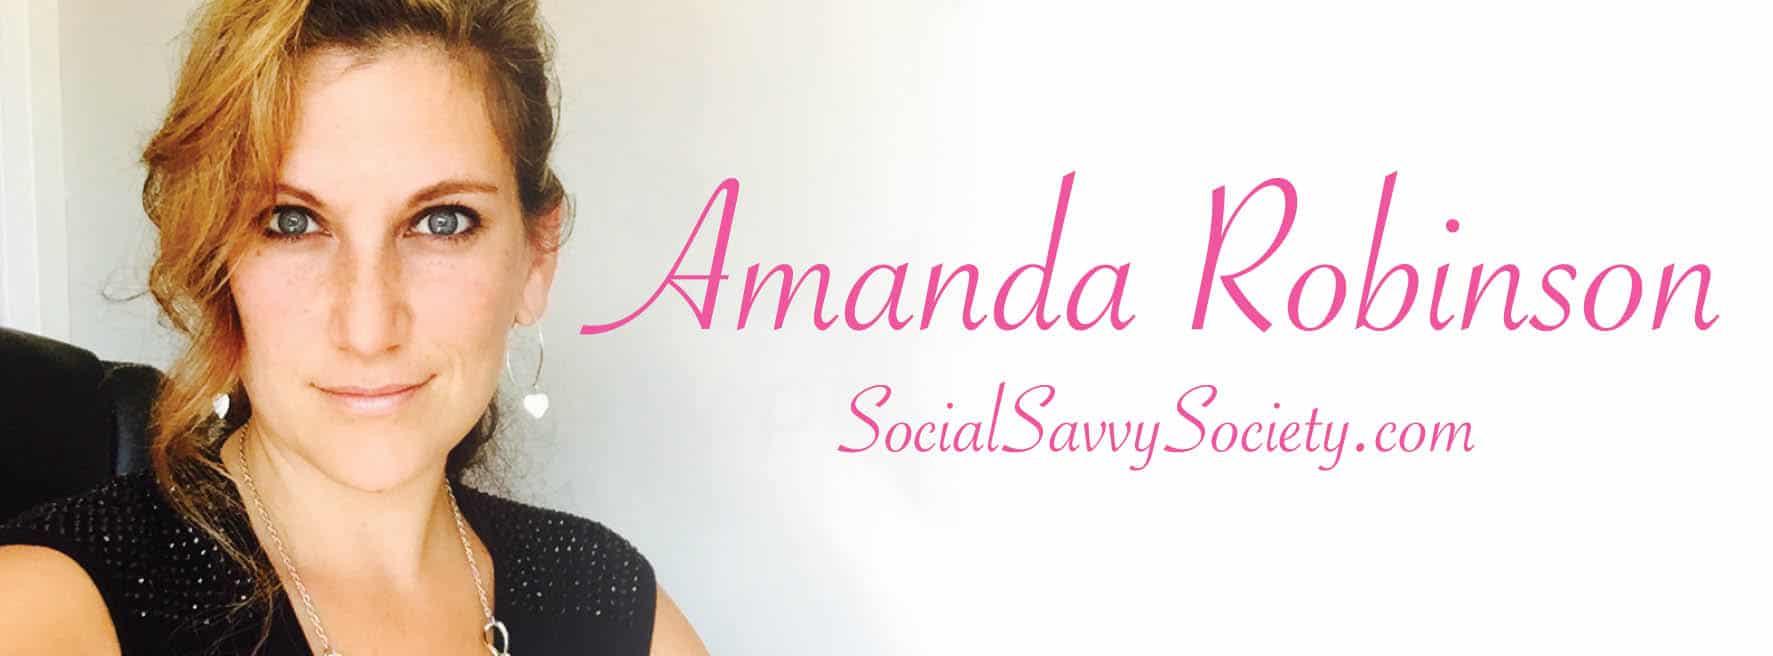 Amanda Robinson